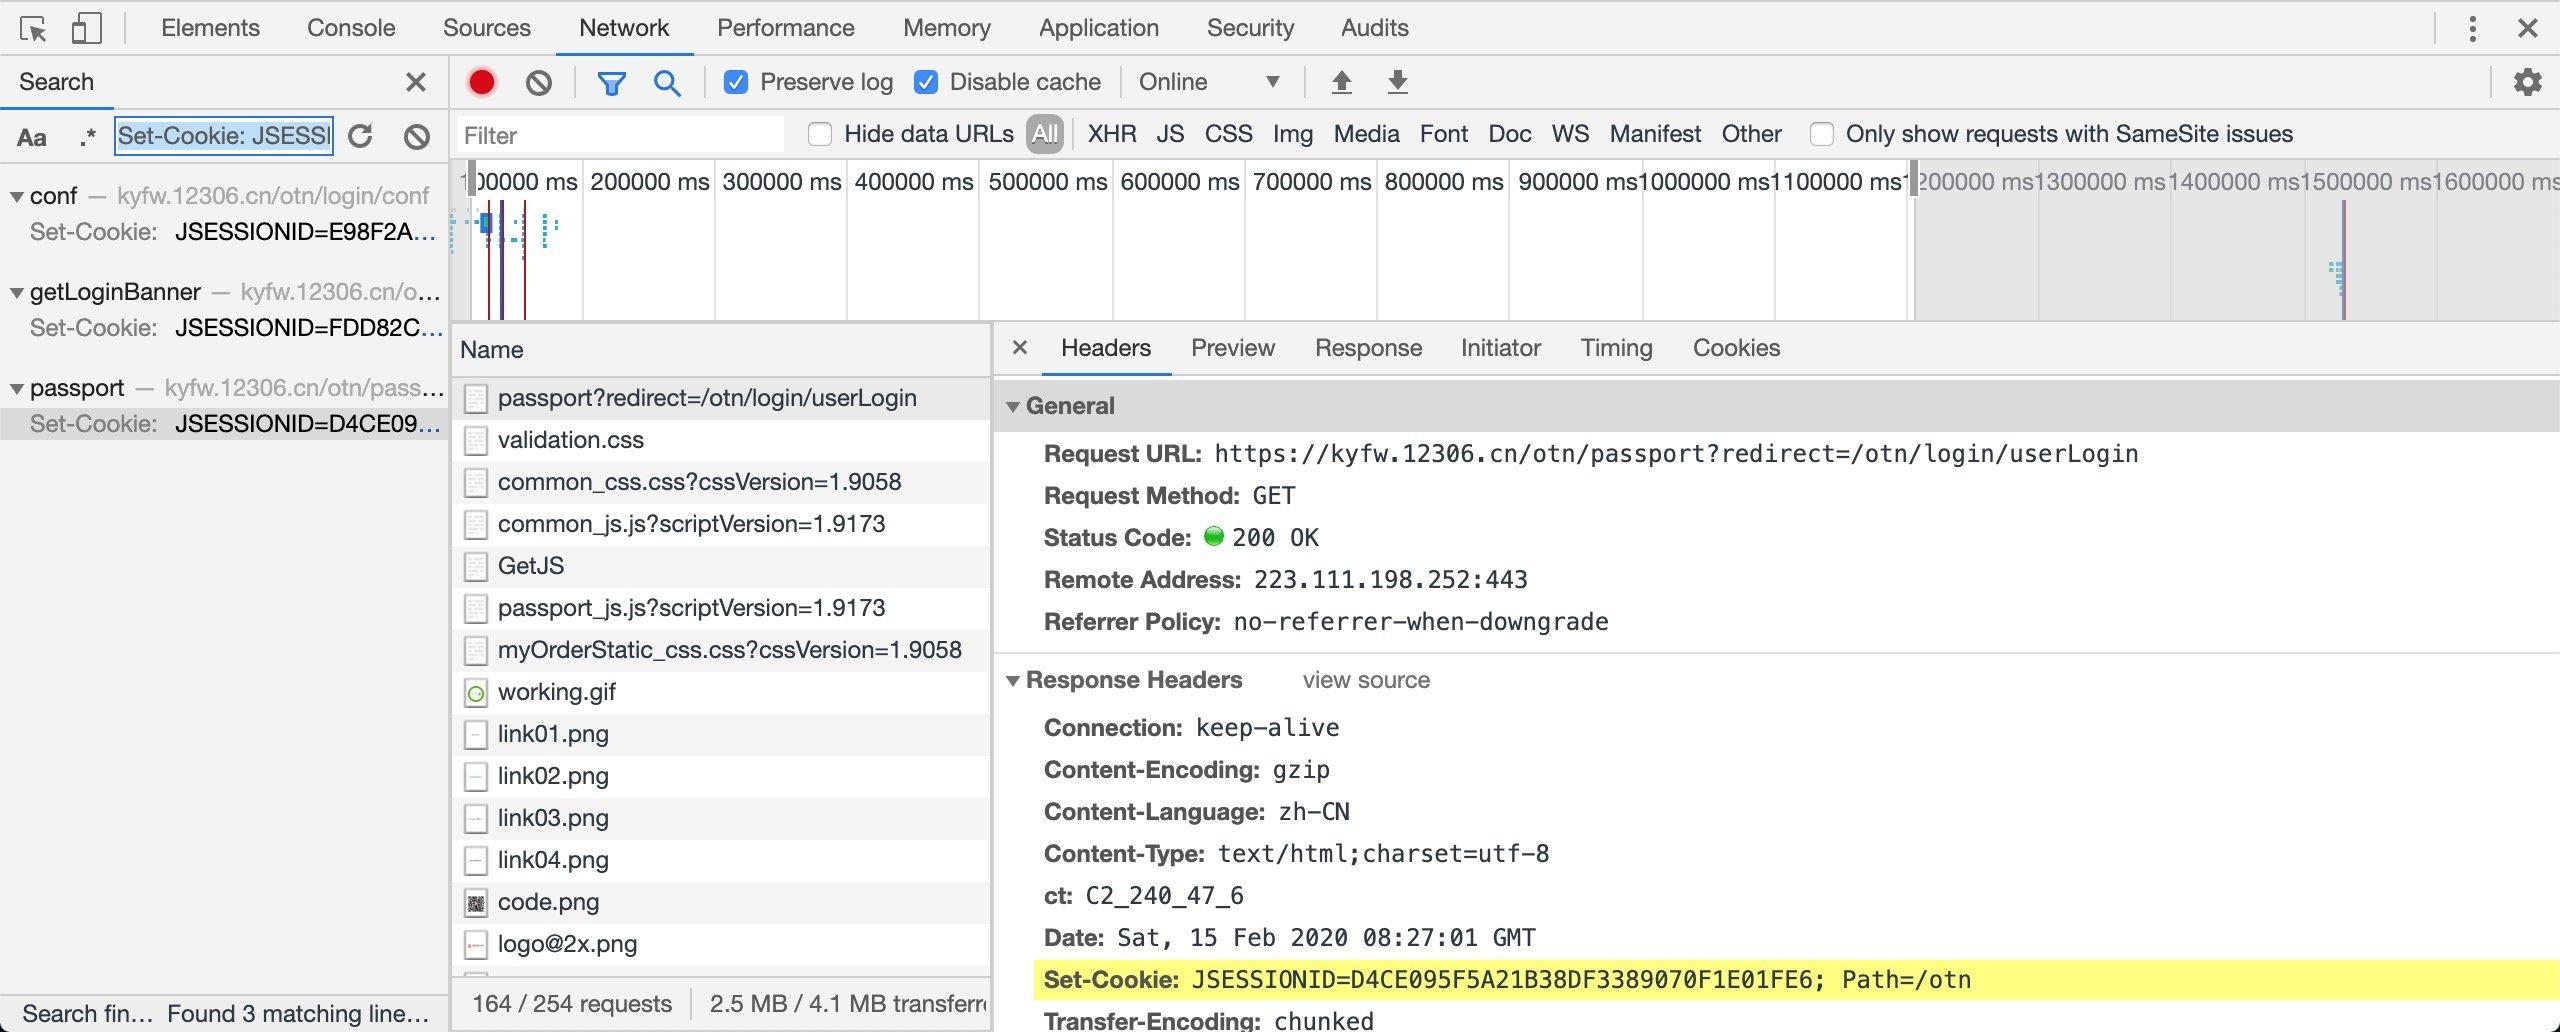 12306-algorithm-web-js-network-search-cookie-JSESSIONID.png